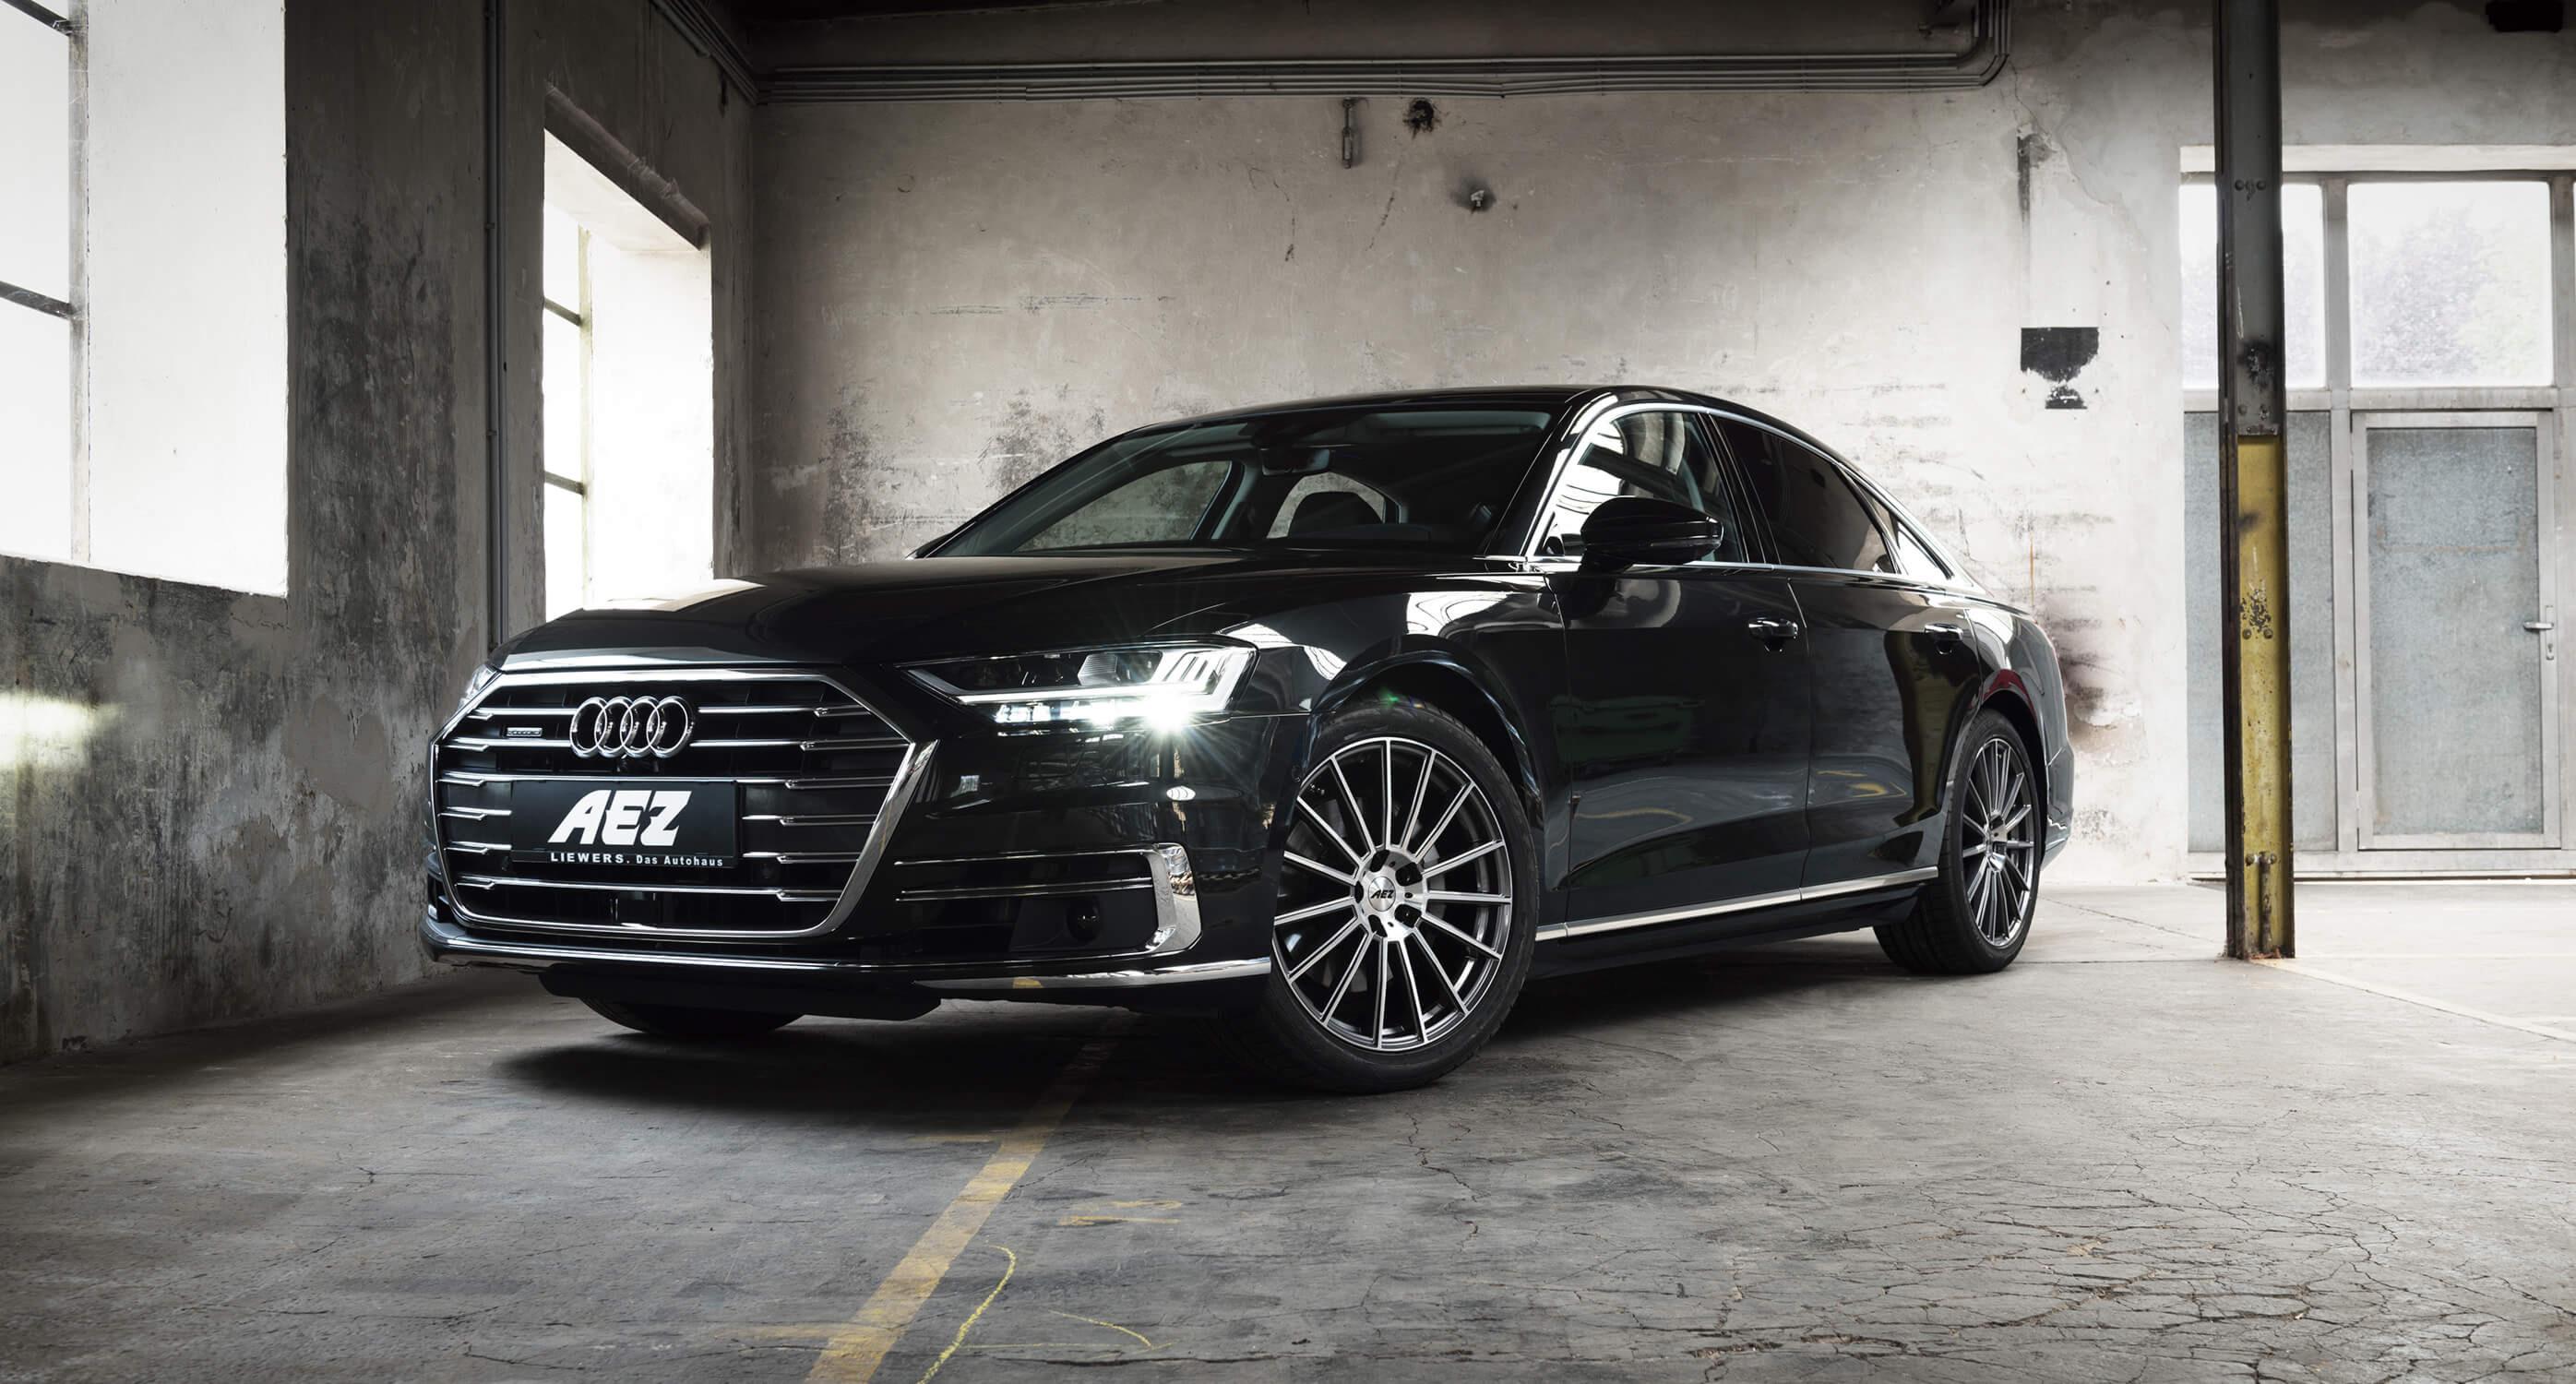 The New Audi A8 On Aez Steam Aez News